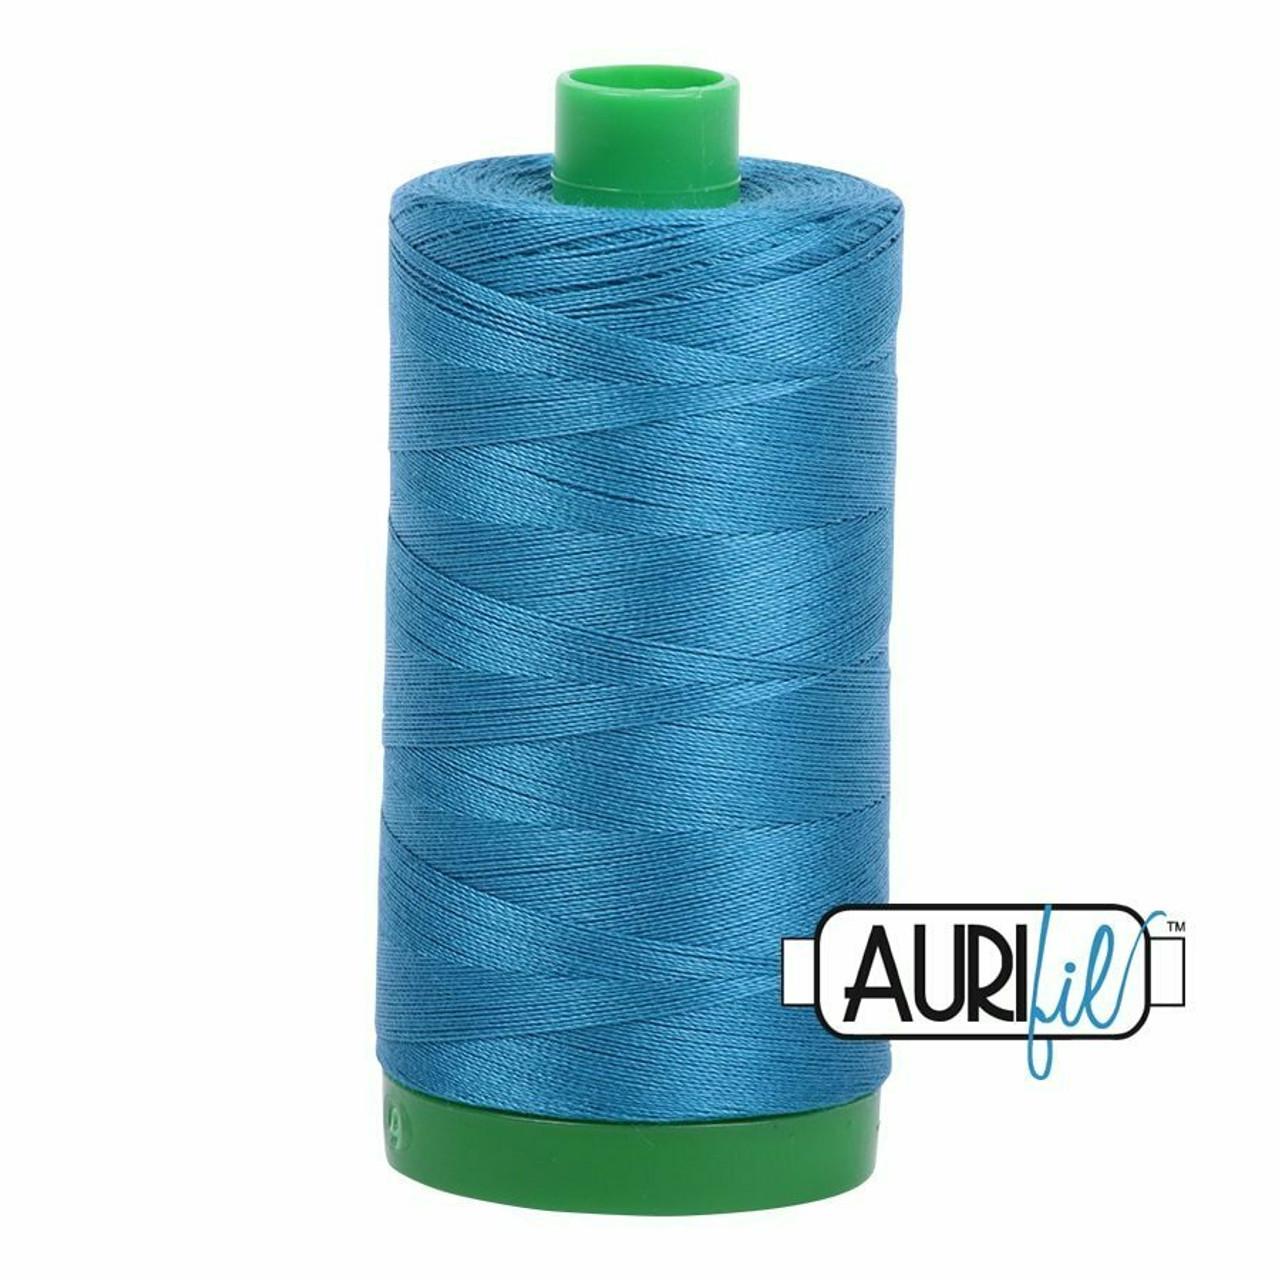 Aurifil 40wt Medium Teal (1125) thread